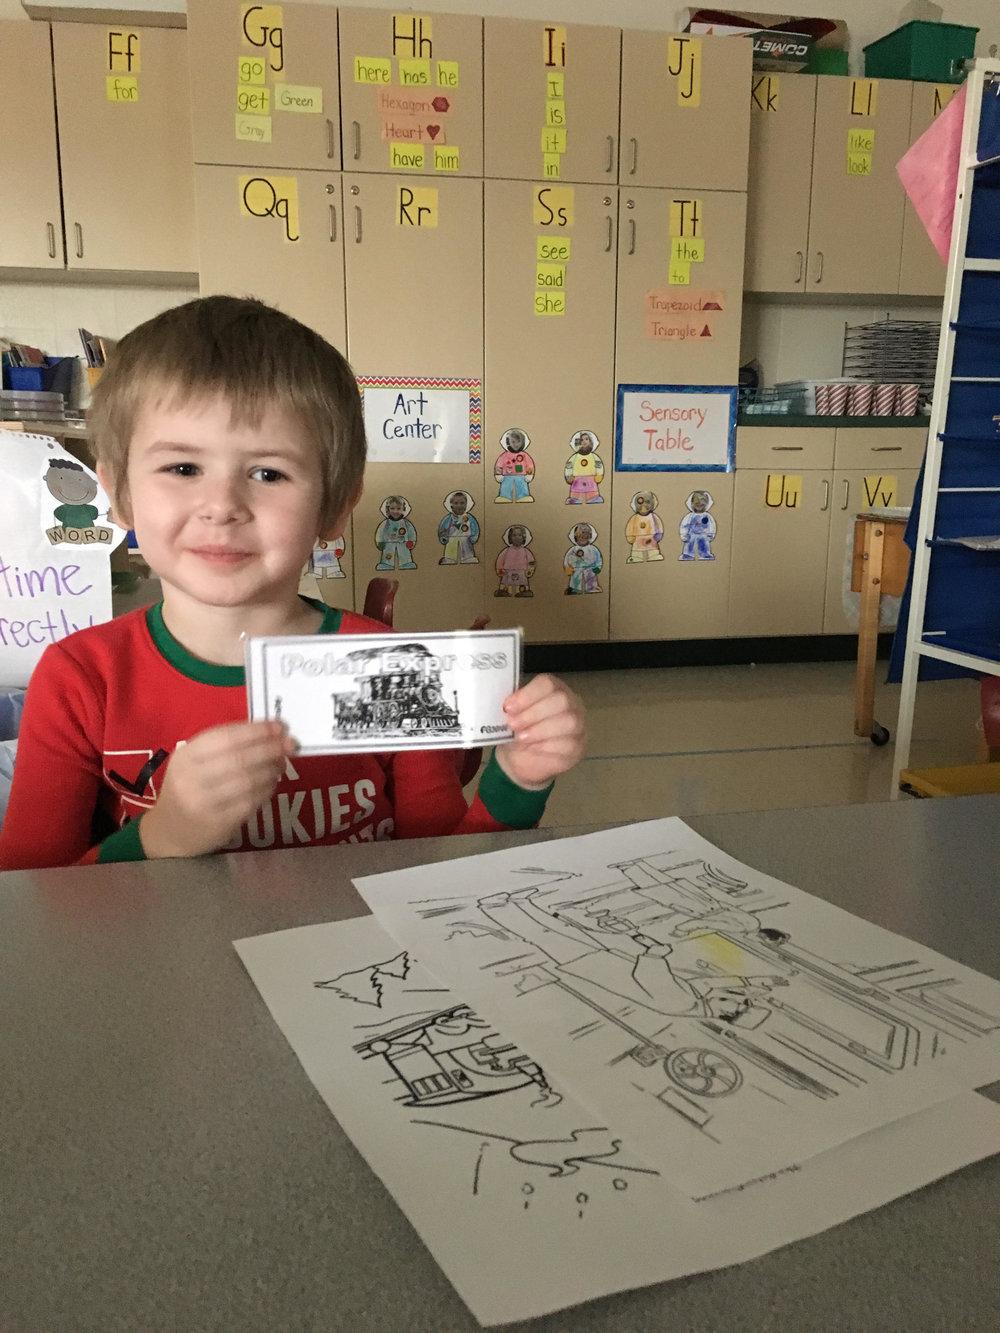 He has his Polar Express Ticket